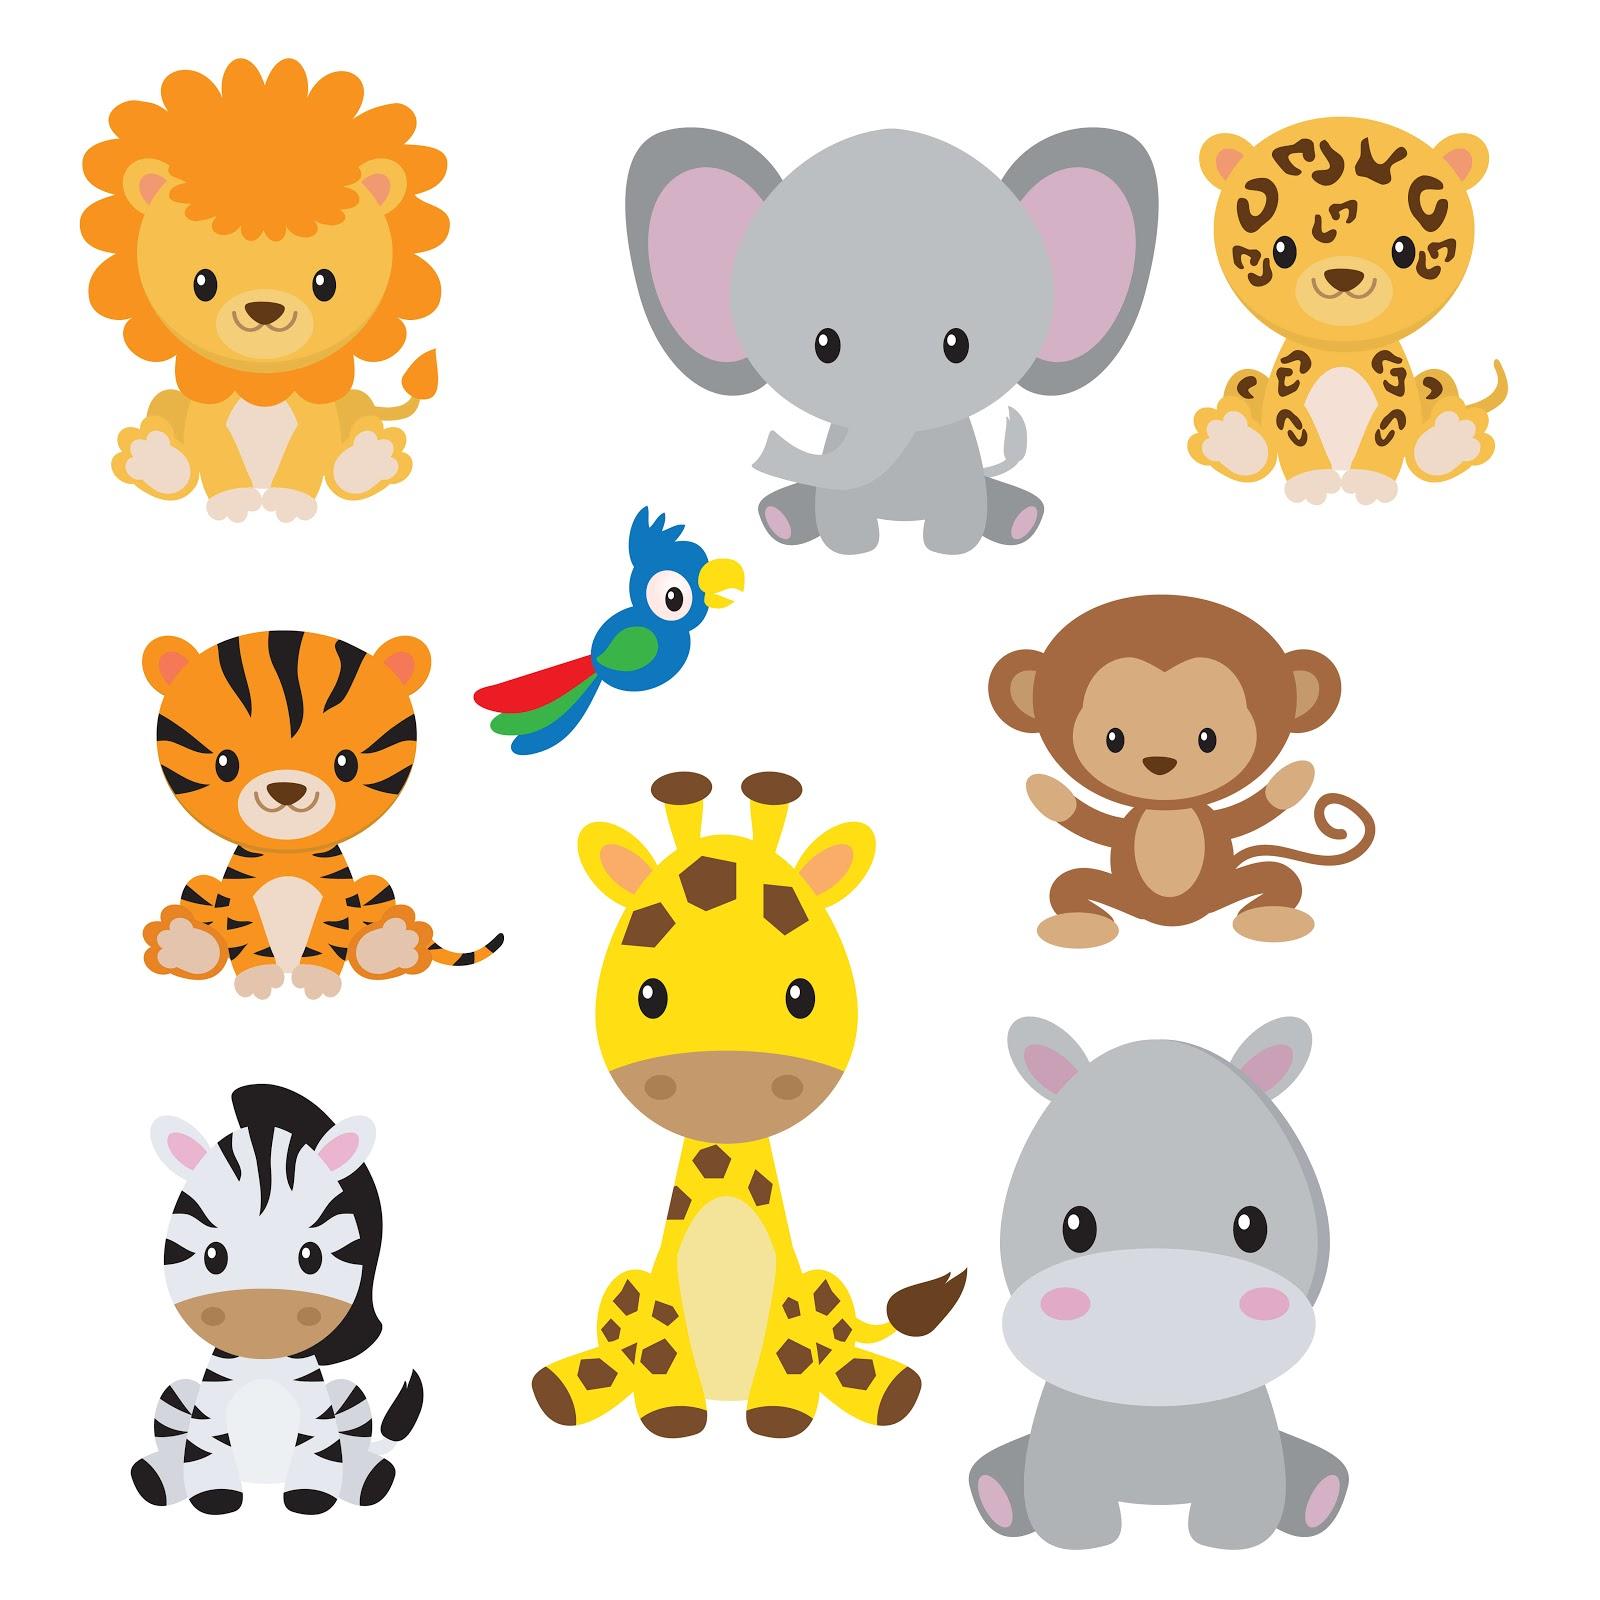 Baby animals, cartoon style